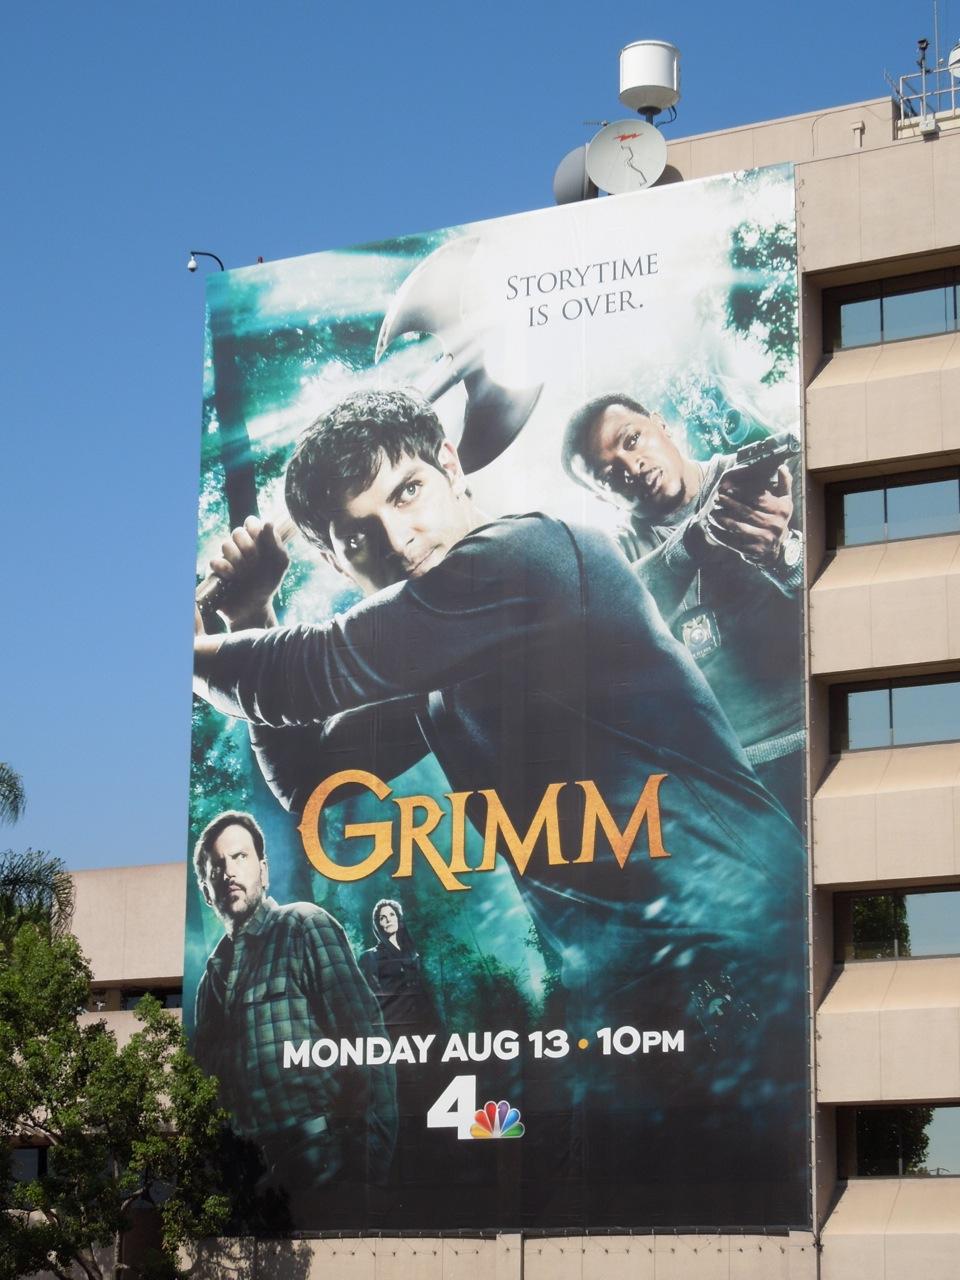 http://3.bp.blogspot.com/-HJoW4HzjuRU/UBiLaG7JWWI/AAAAAAAAu7E/A8hezjmsXmk/s1600/Giant+Grimm+season2+billboard.jpg